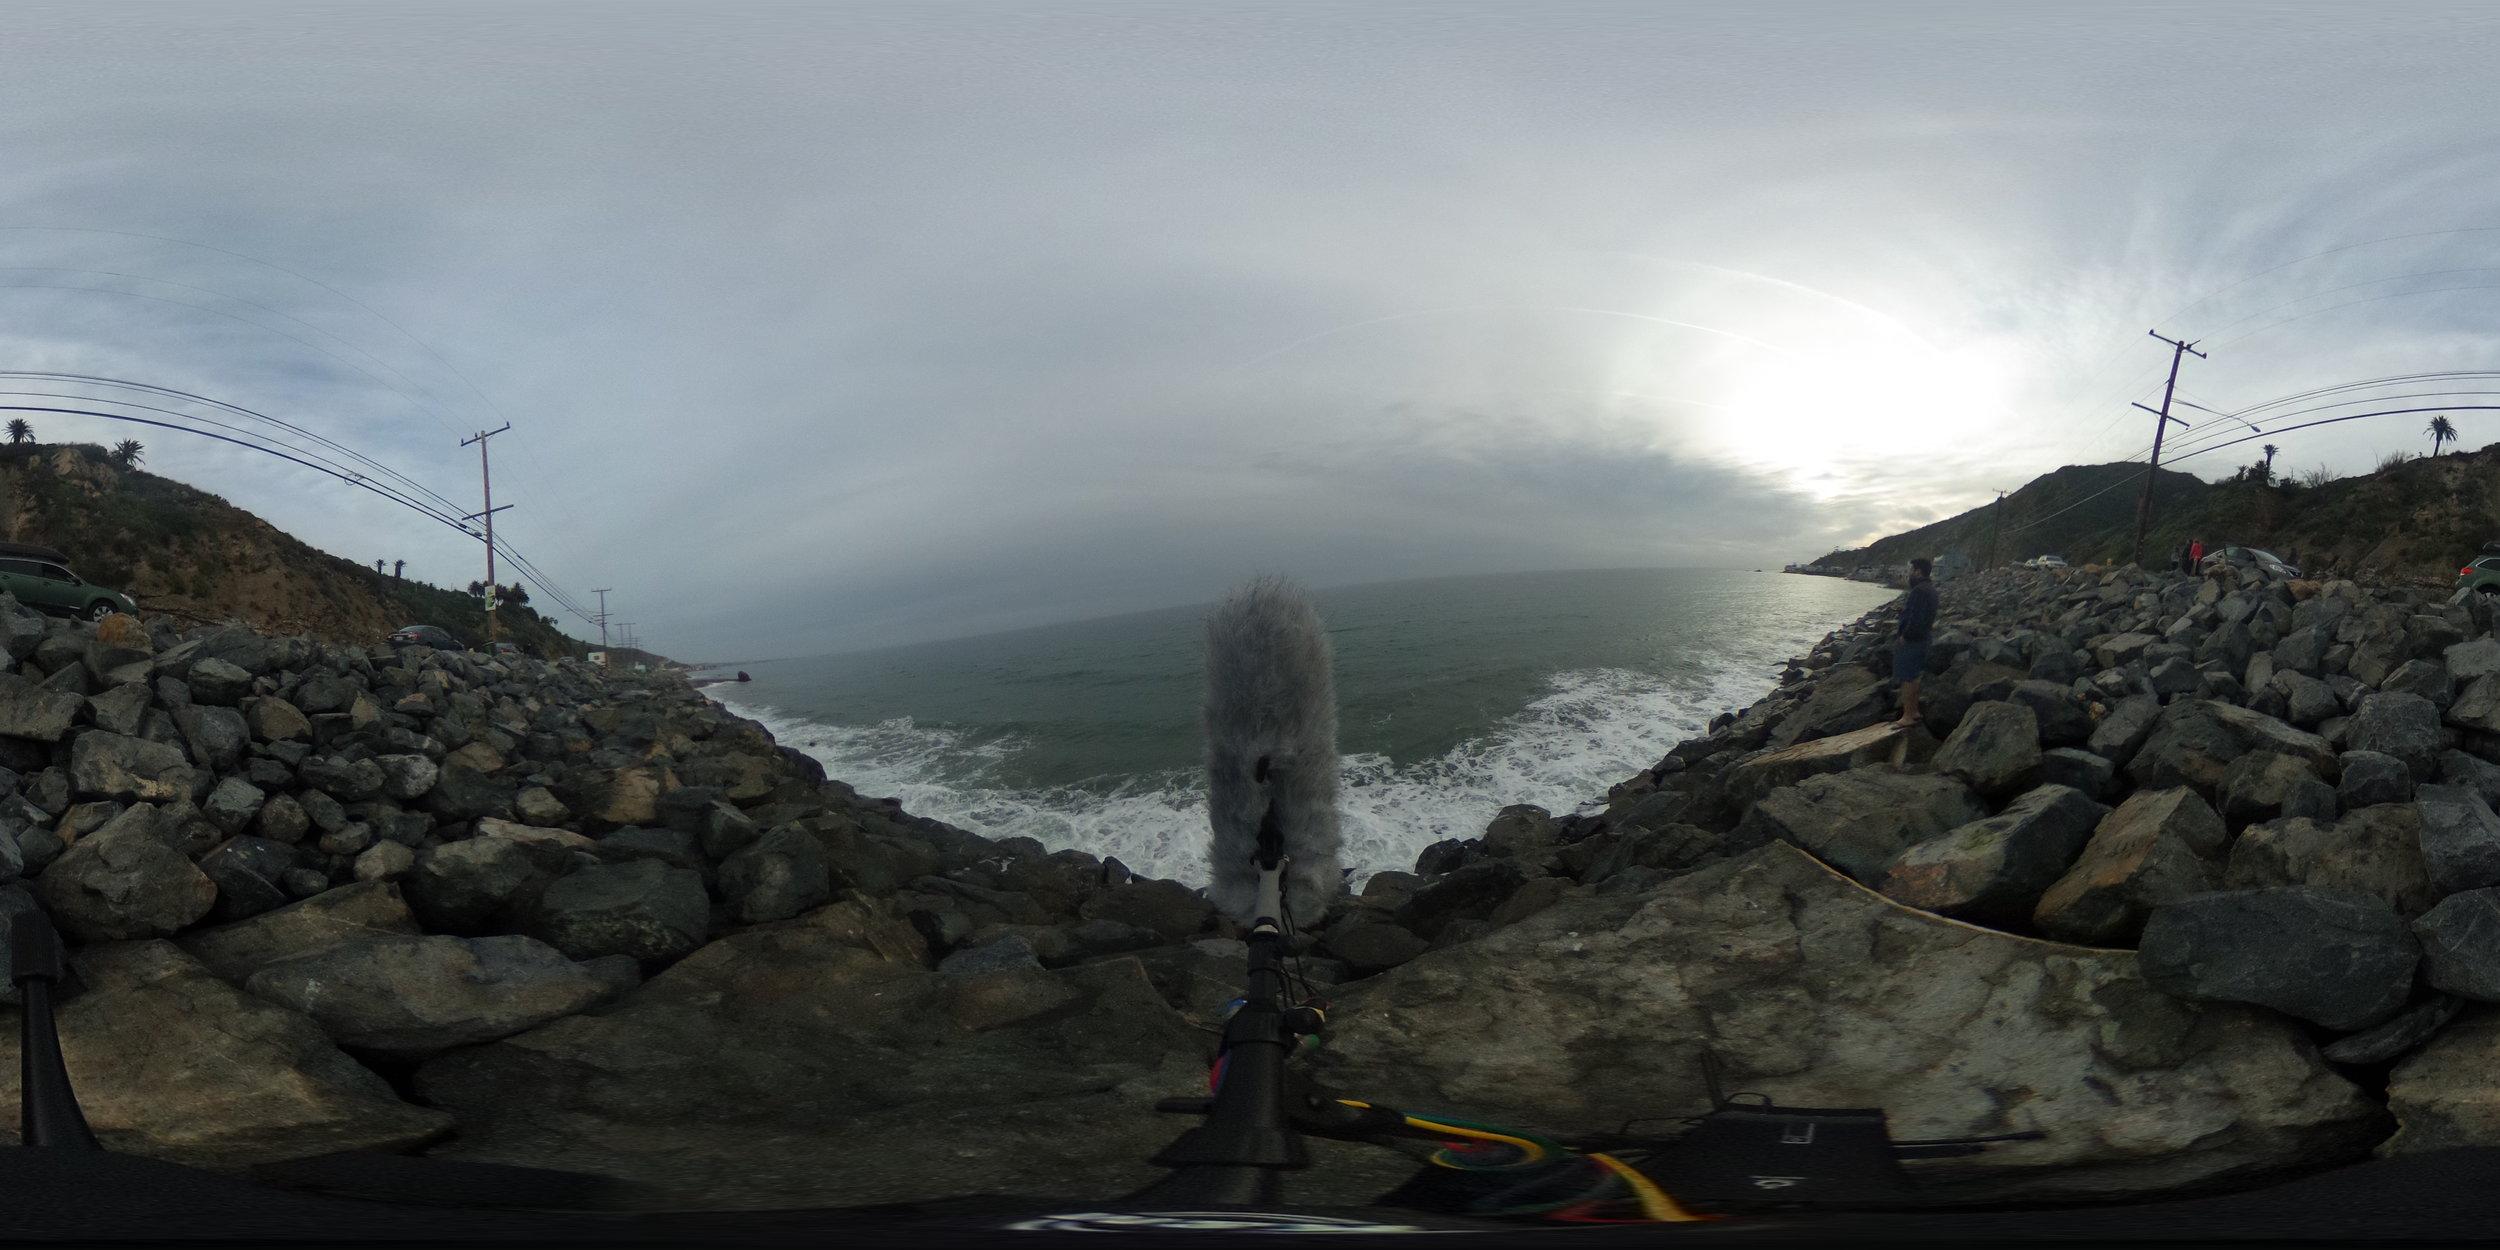 EXT_Day_Beach_RockyCliff_WavesonRocks_OceanSpray_OceanFoam_MediumHighwayTraffic_JPEG.JPG